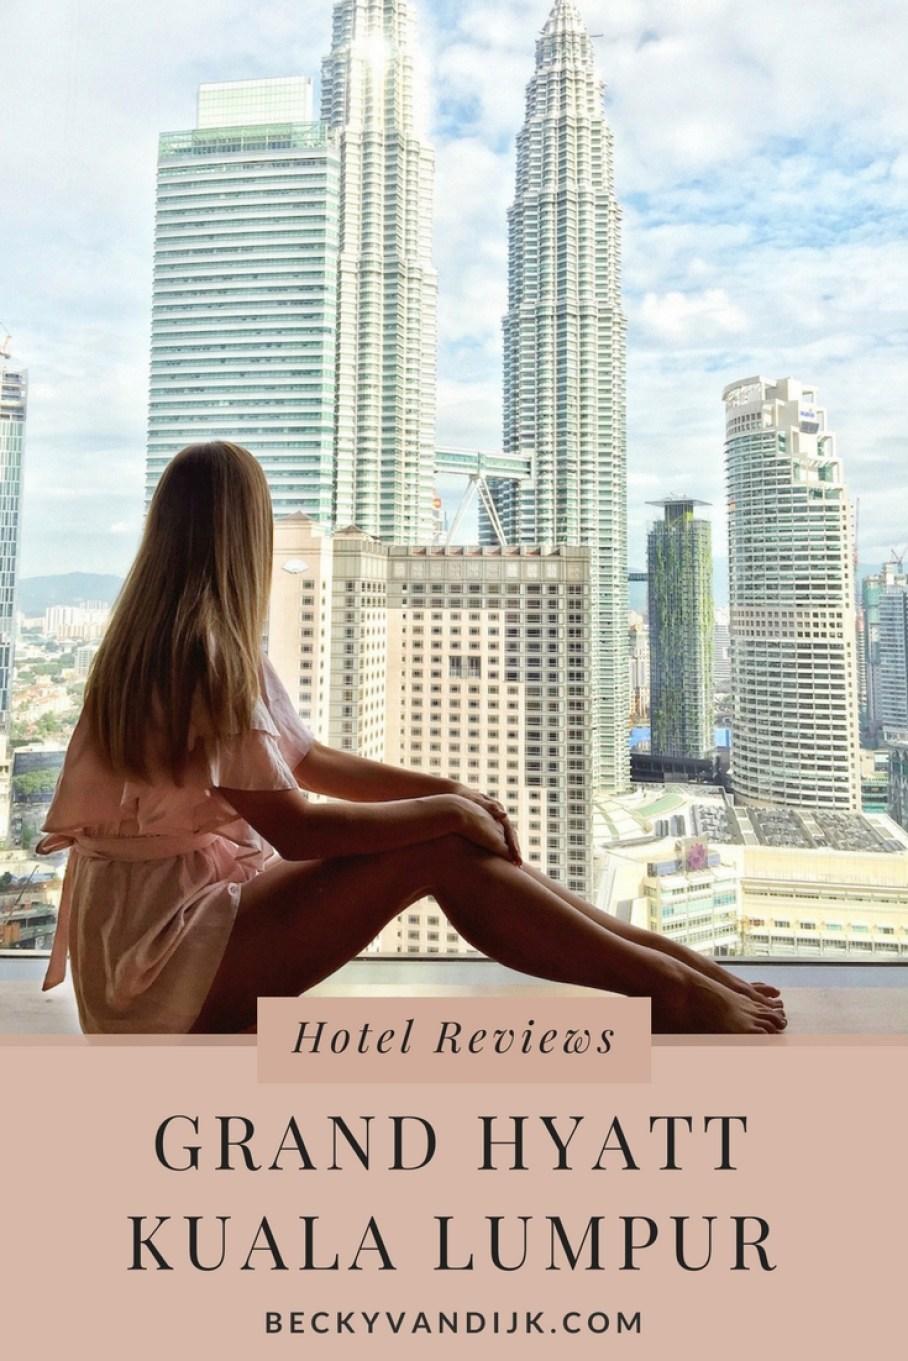 Hotel Review Grand Hyatt Kuala Lumpur